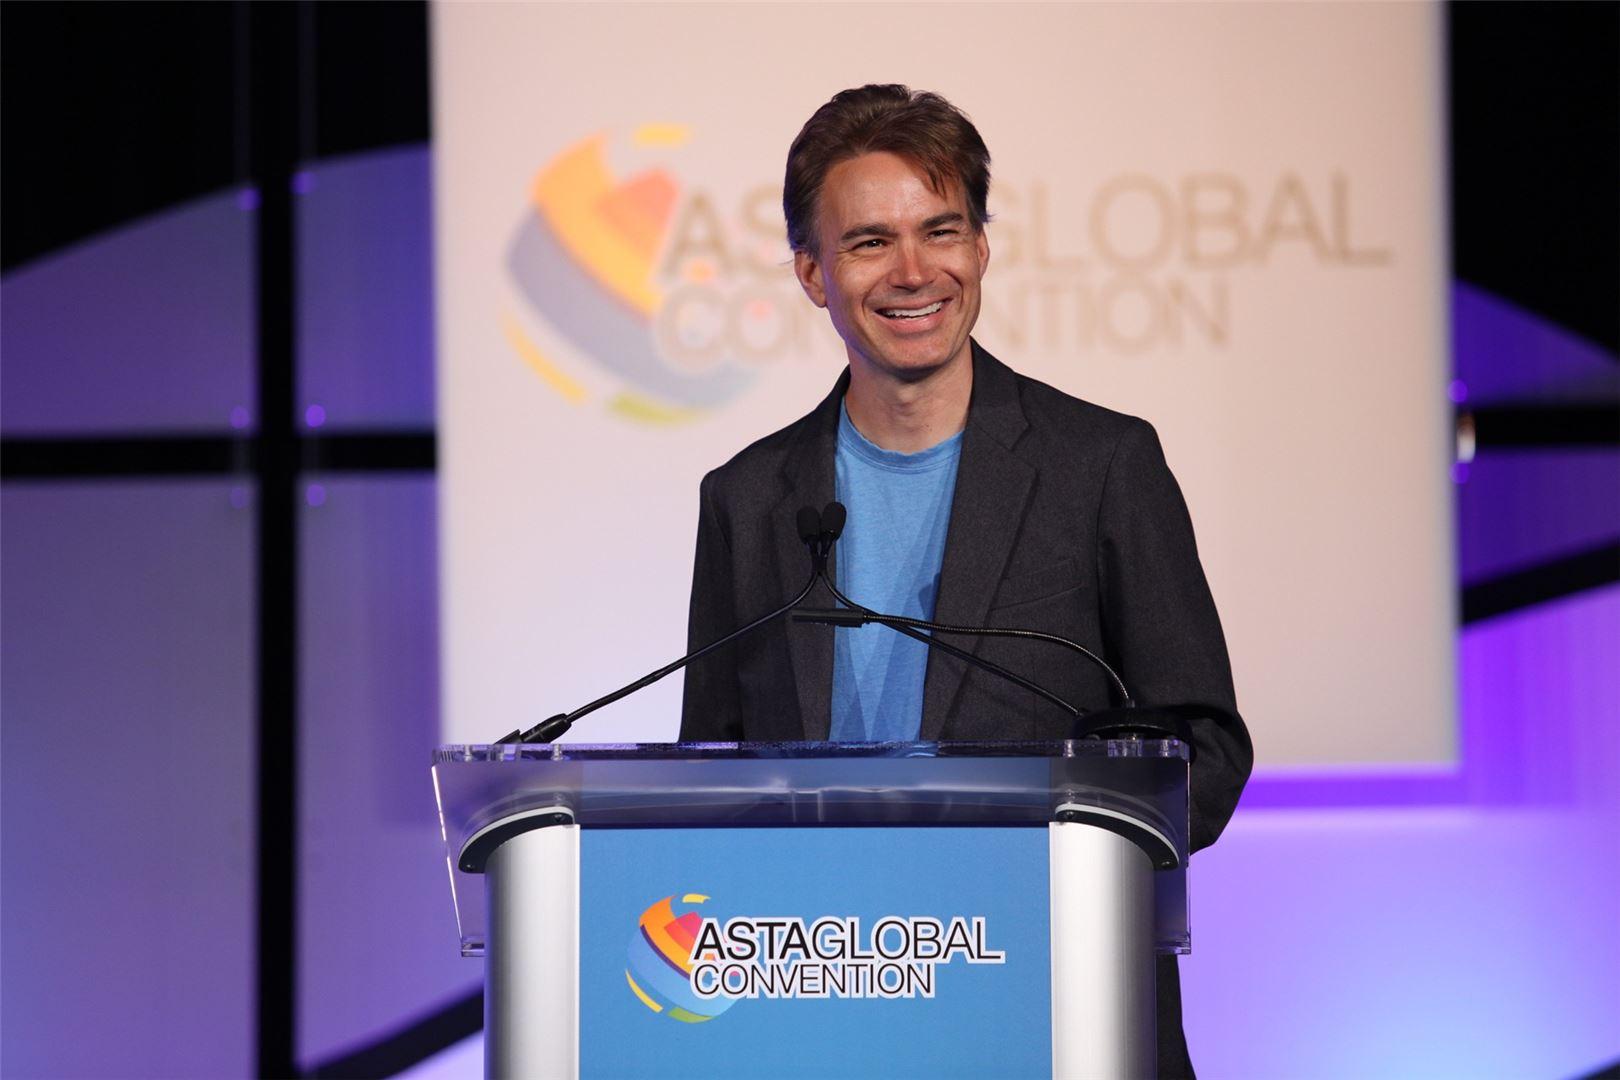 Consumer advocate Christopher Elliot